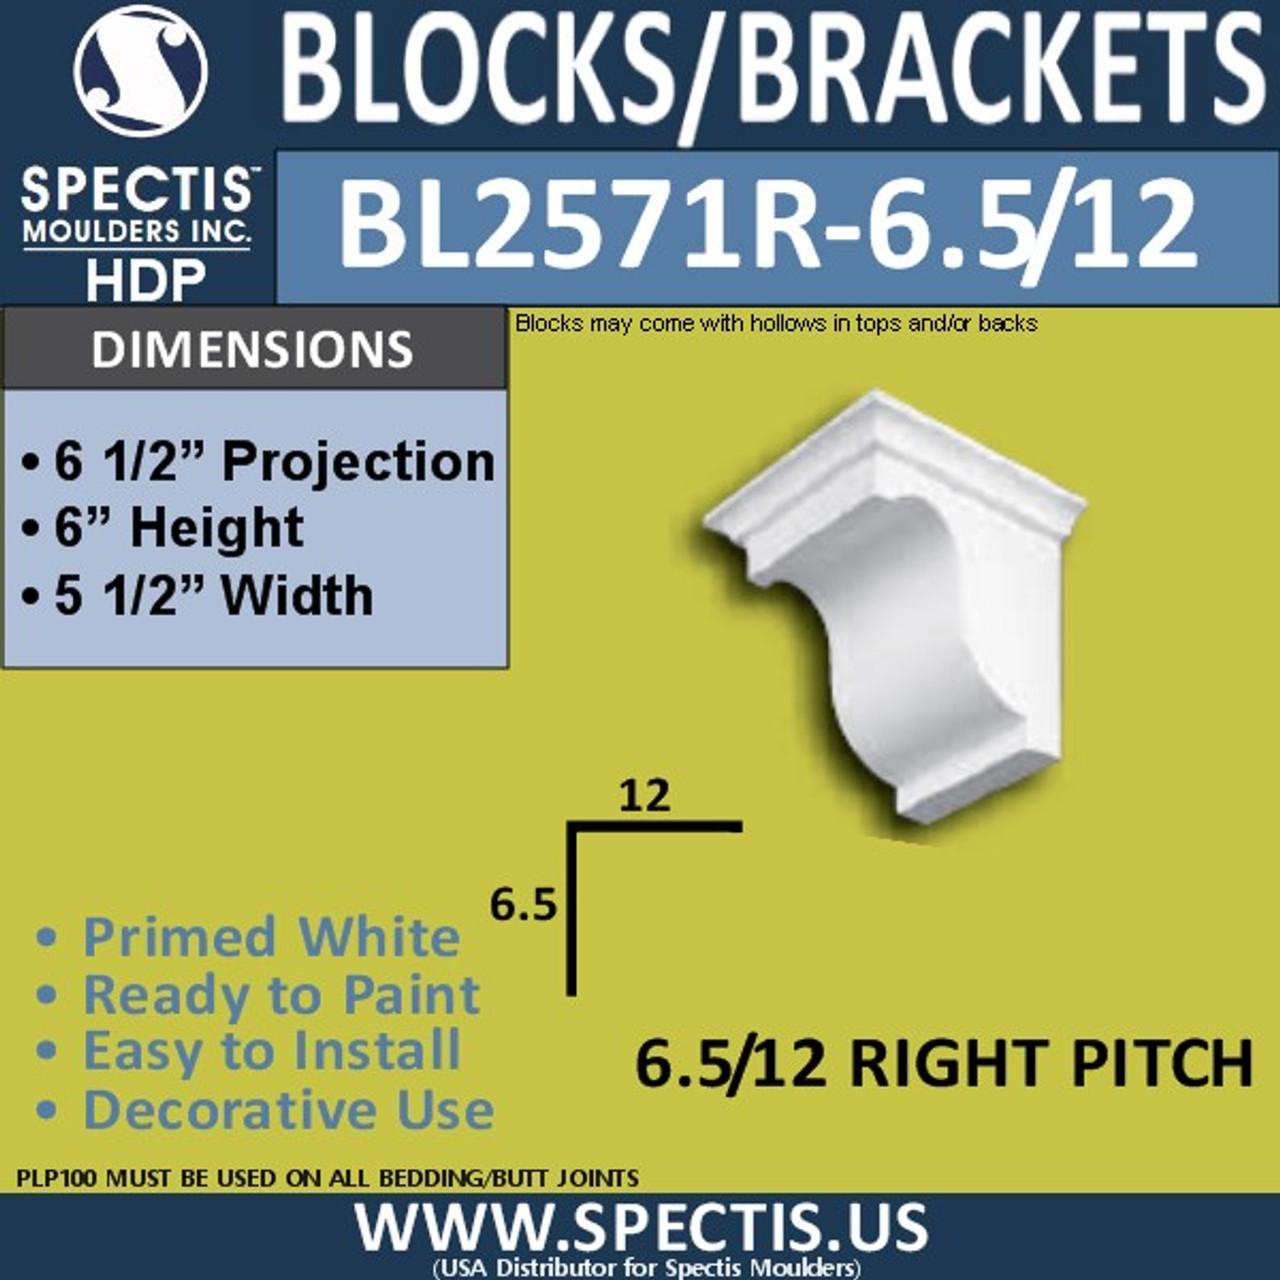 "BL2571R-6.5/12 Pitch Eave Bracket 5.5""W x 6""H x 6.5"" P"